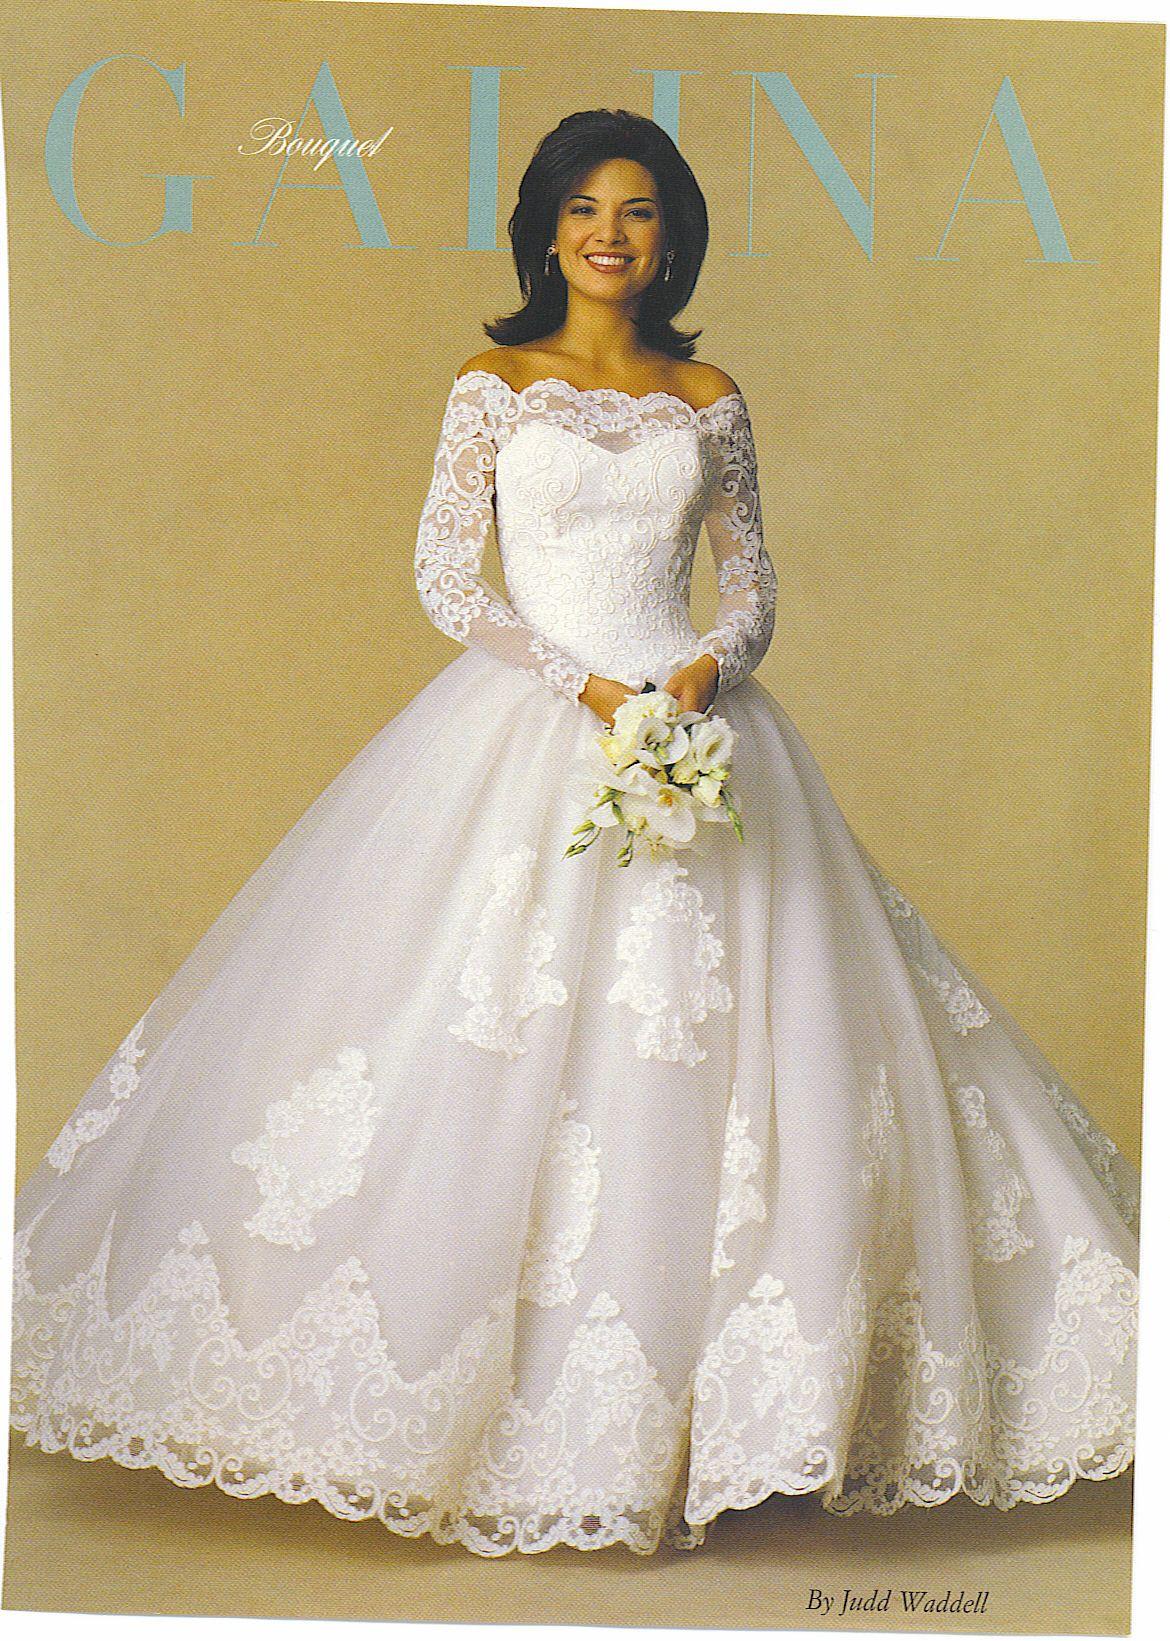 Modern vintage wedding dresses  Pin by n loren on uS AND uS BRIDAL WEDDING FASHION  Pinterest